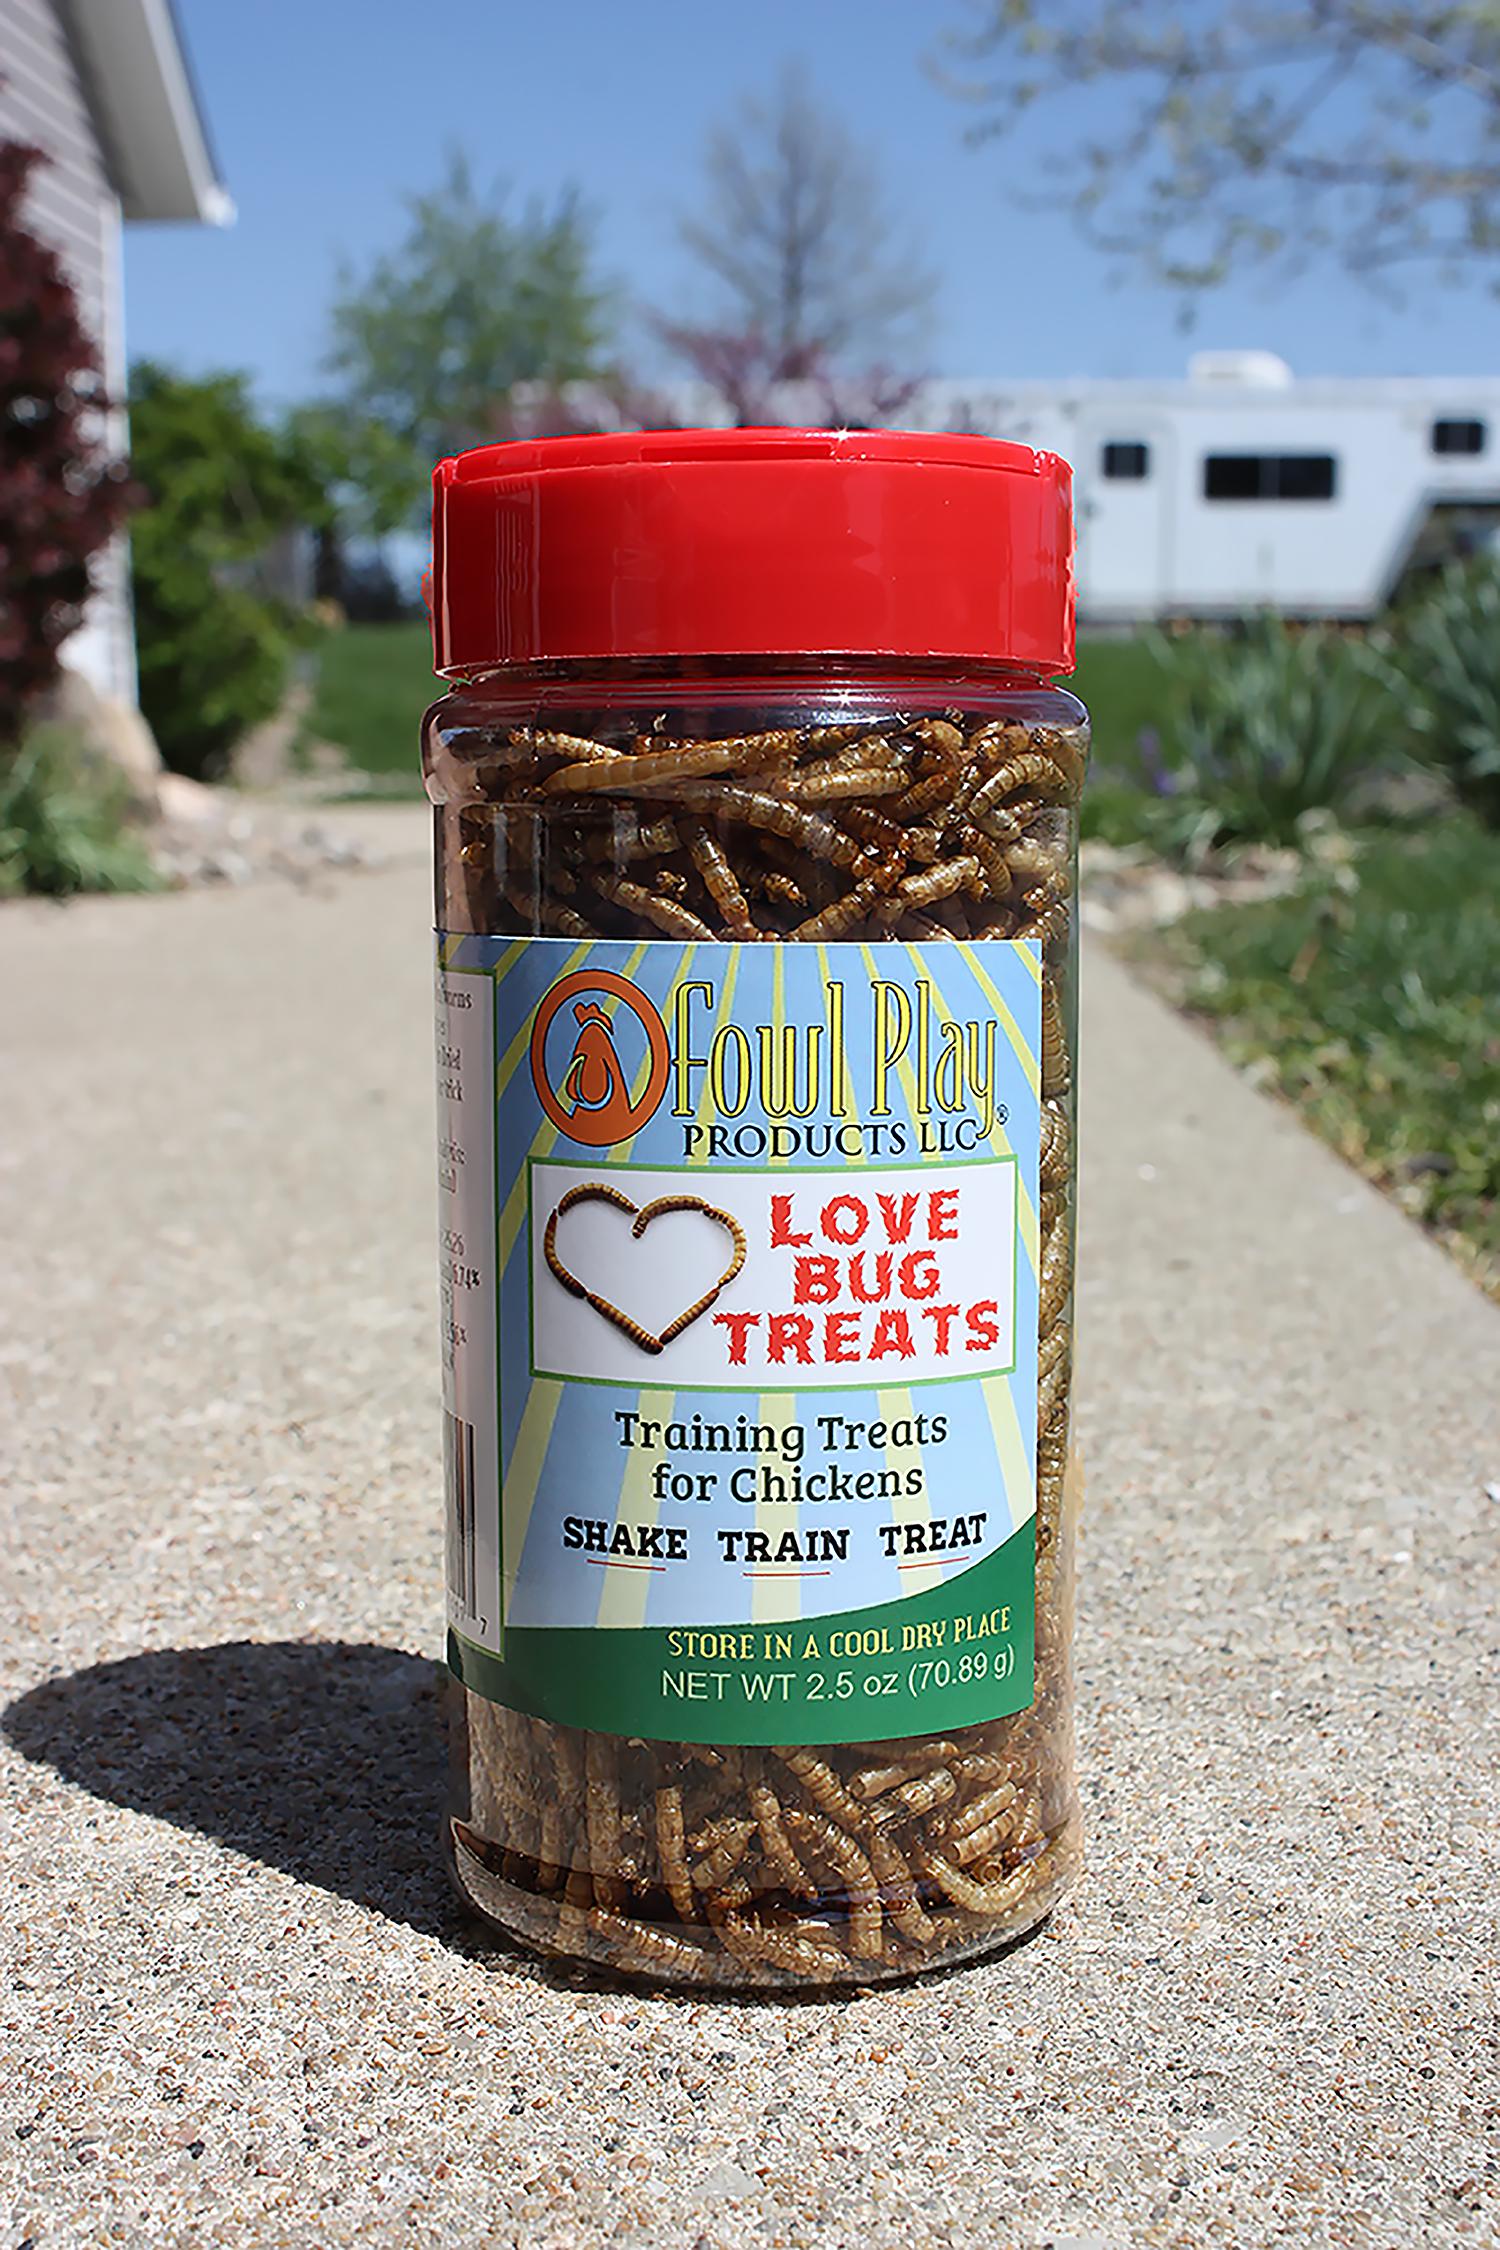 3love-bug-treats-300-dpi-4x7